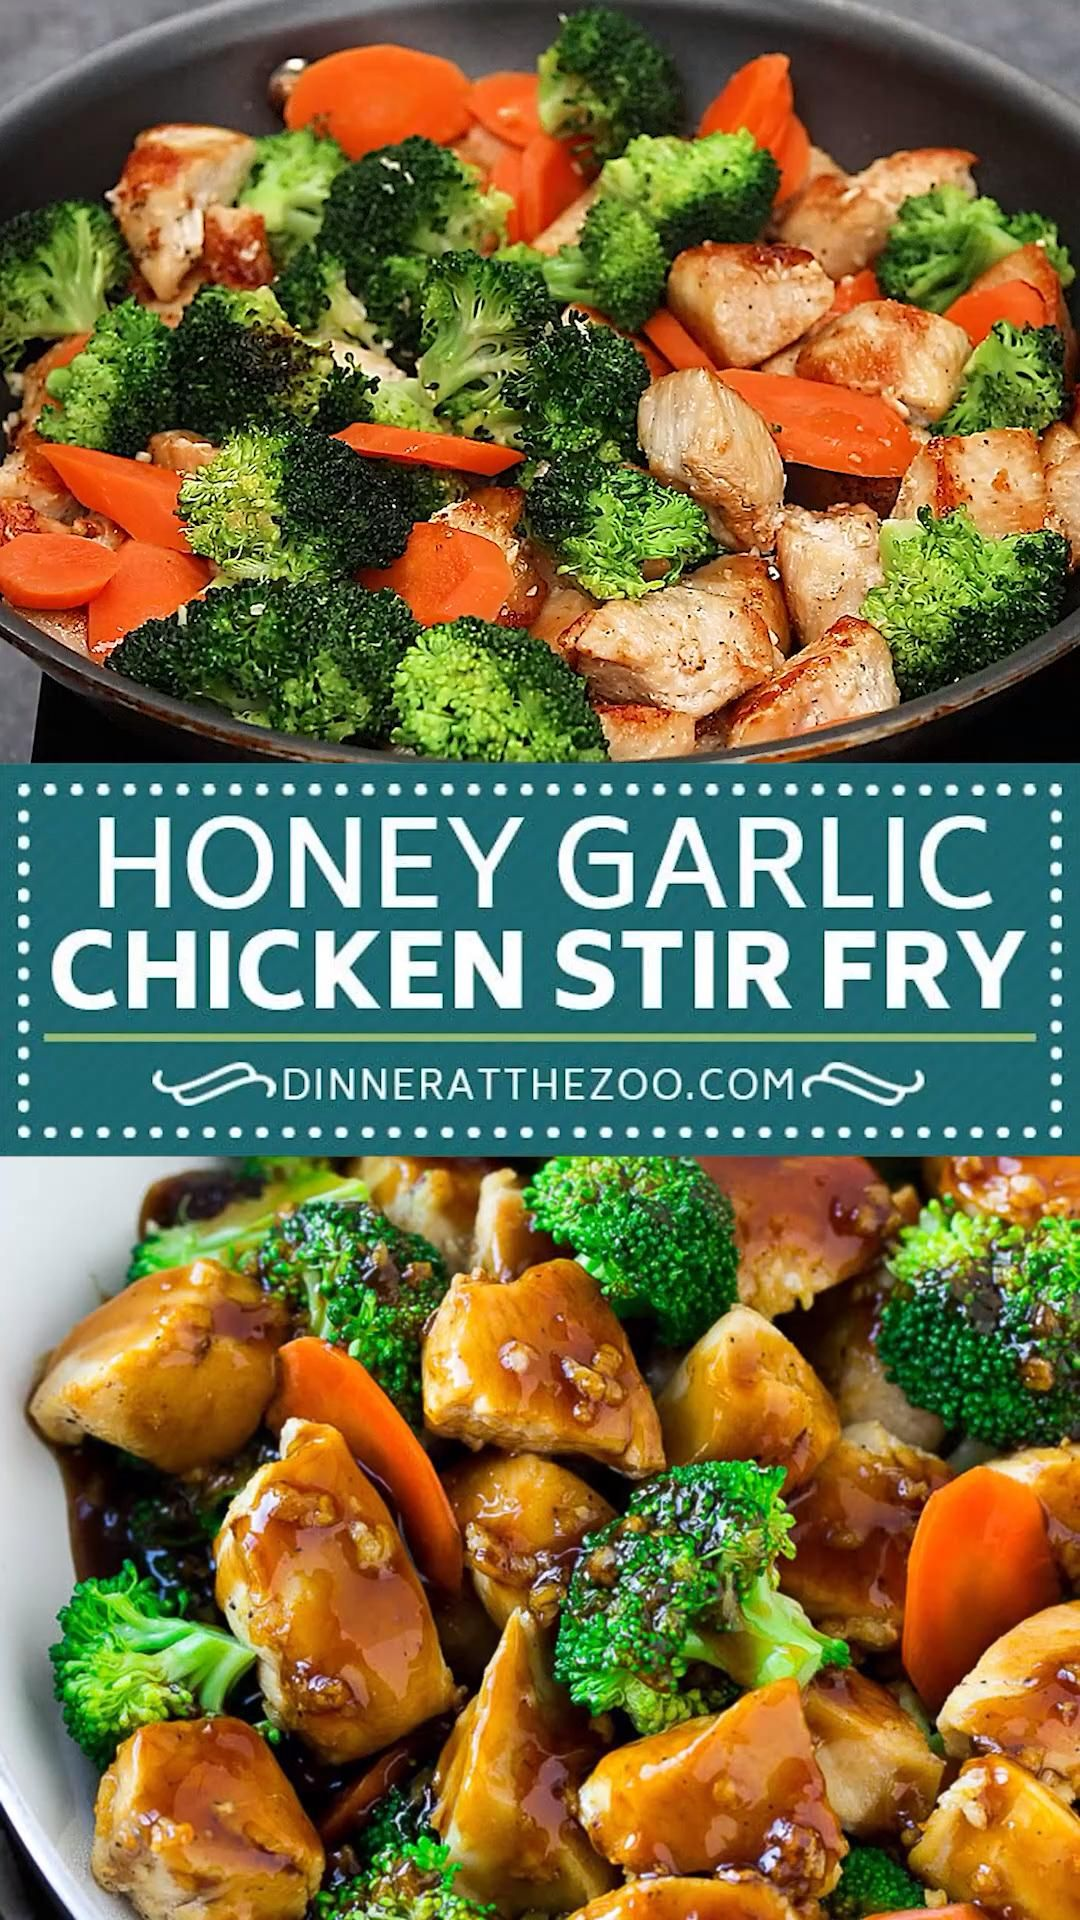 Photo of honey garlic chicken stir fry